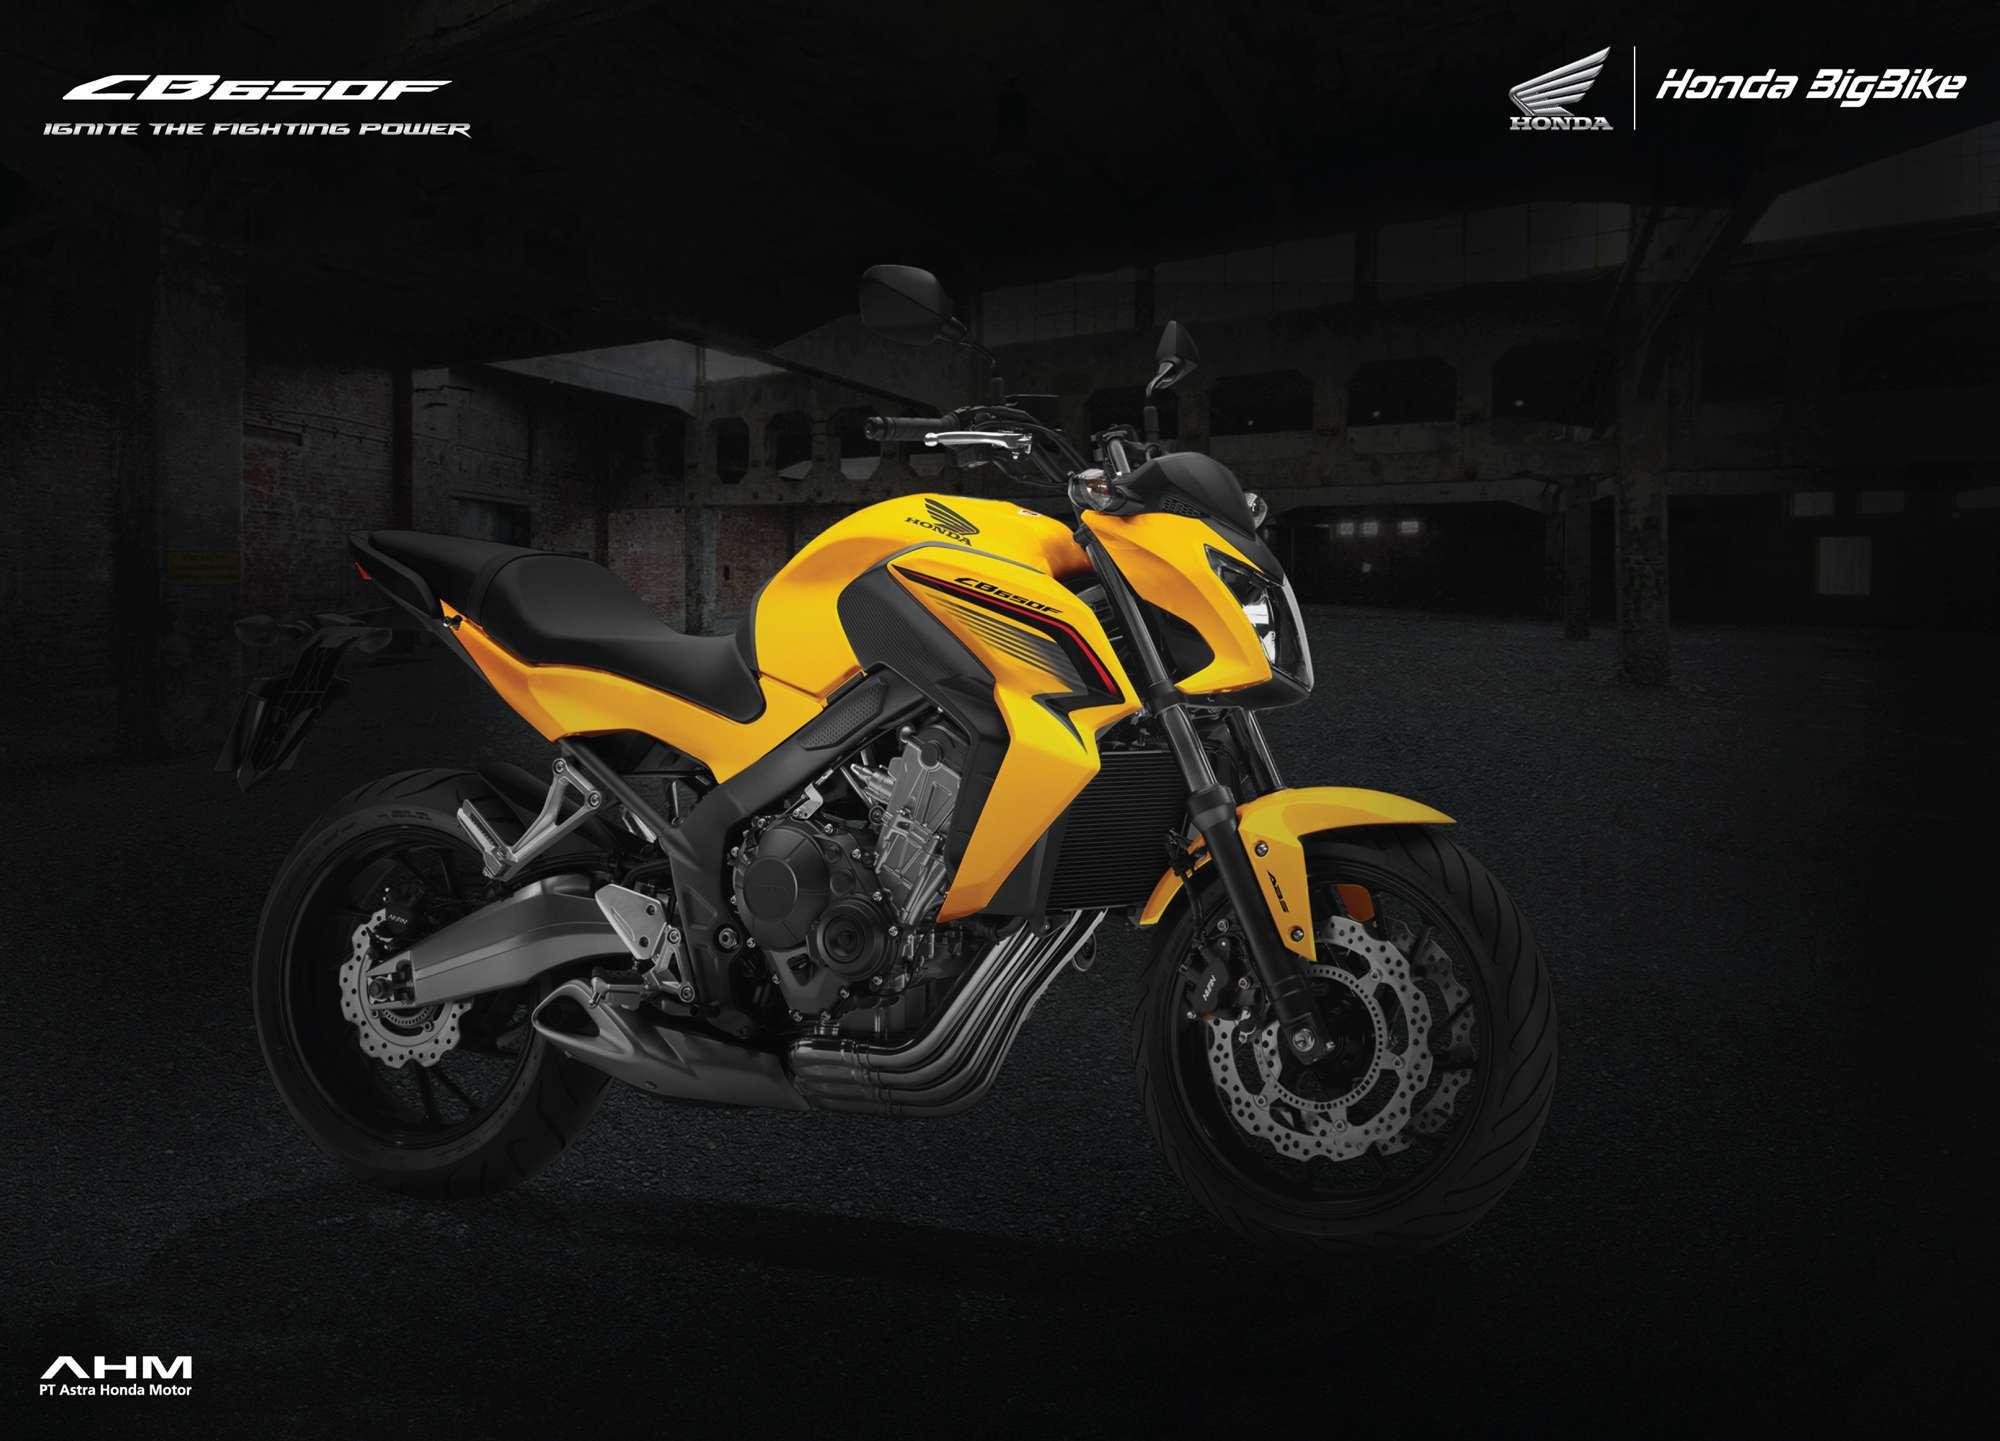 Honda Beat Esppop Kredit Motor Dp Murah Jakarta T New Sporty Esp Cbs Iss 2017 Brosur Cb650f